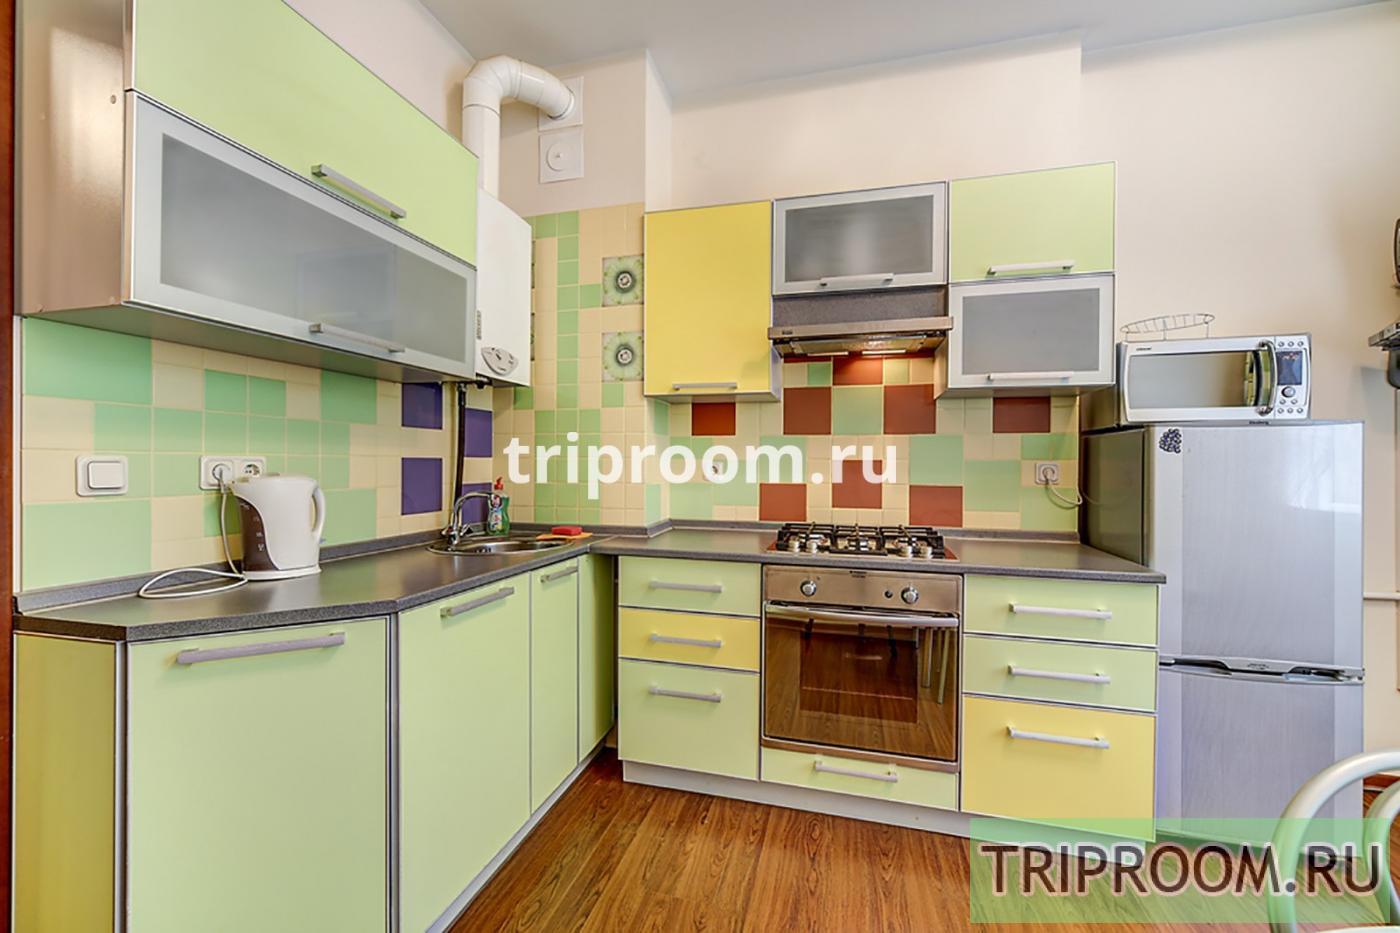 1-комнатная квартира посуточно (вариант № 15527), ул. Канала Грибоедова набережная, фото № 2